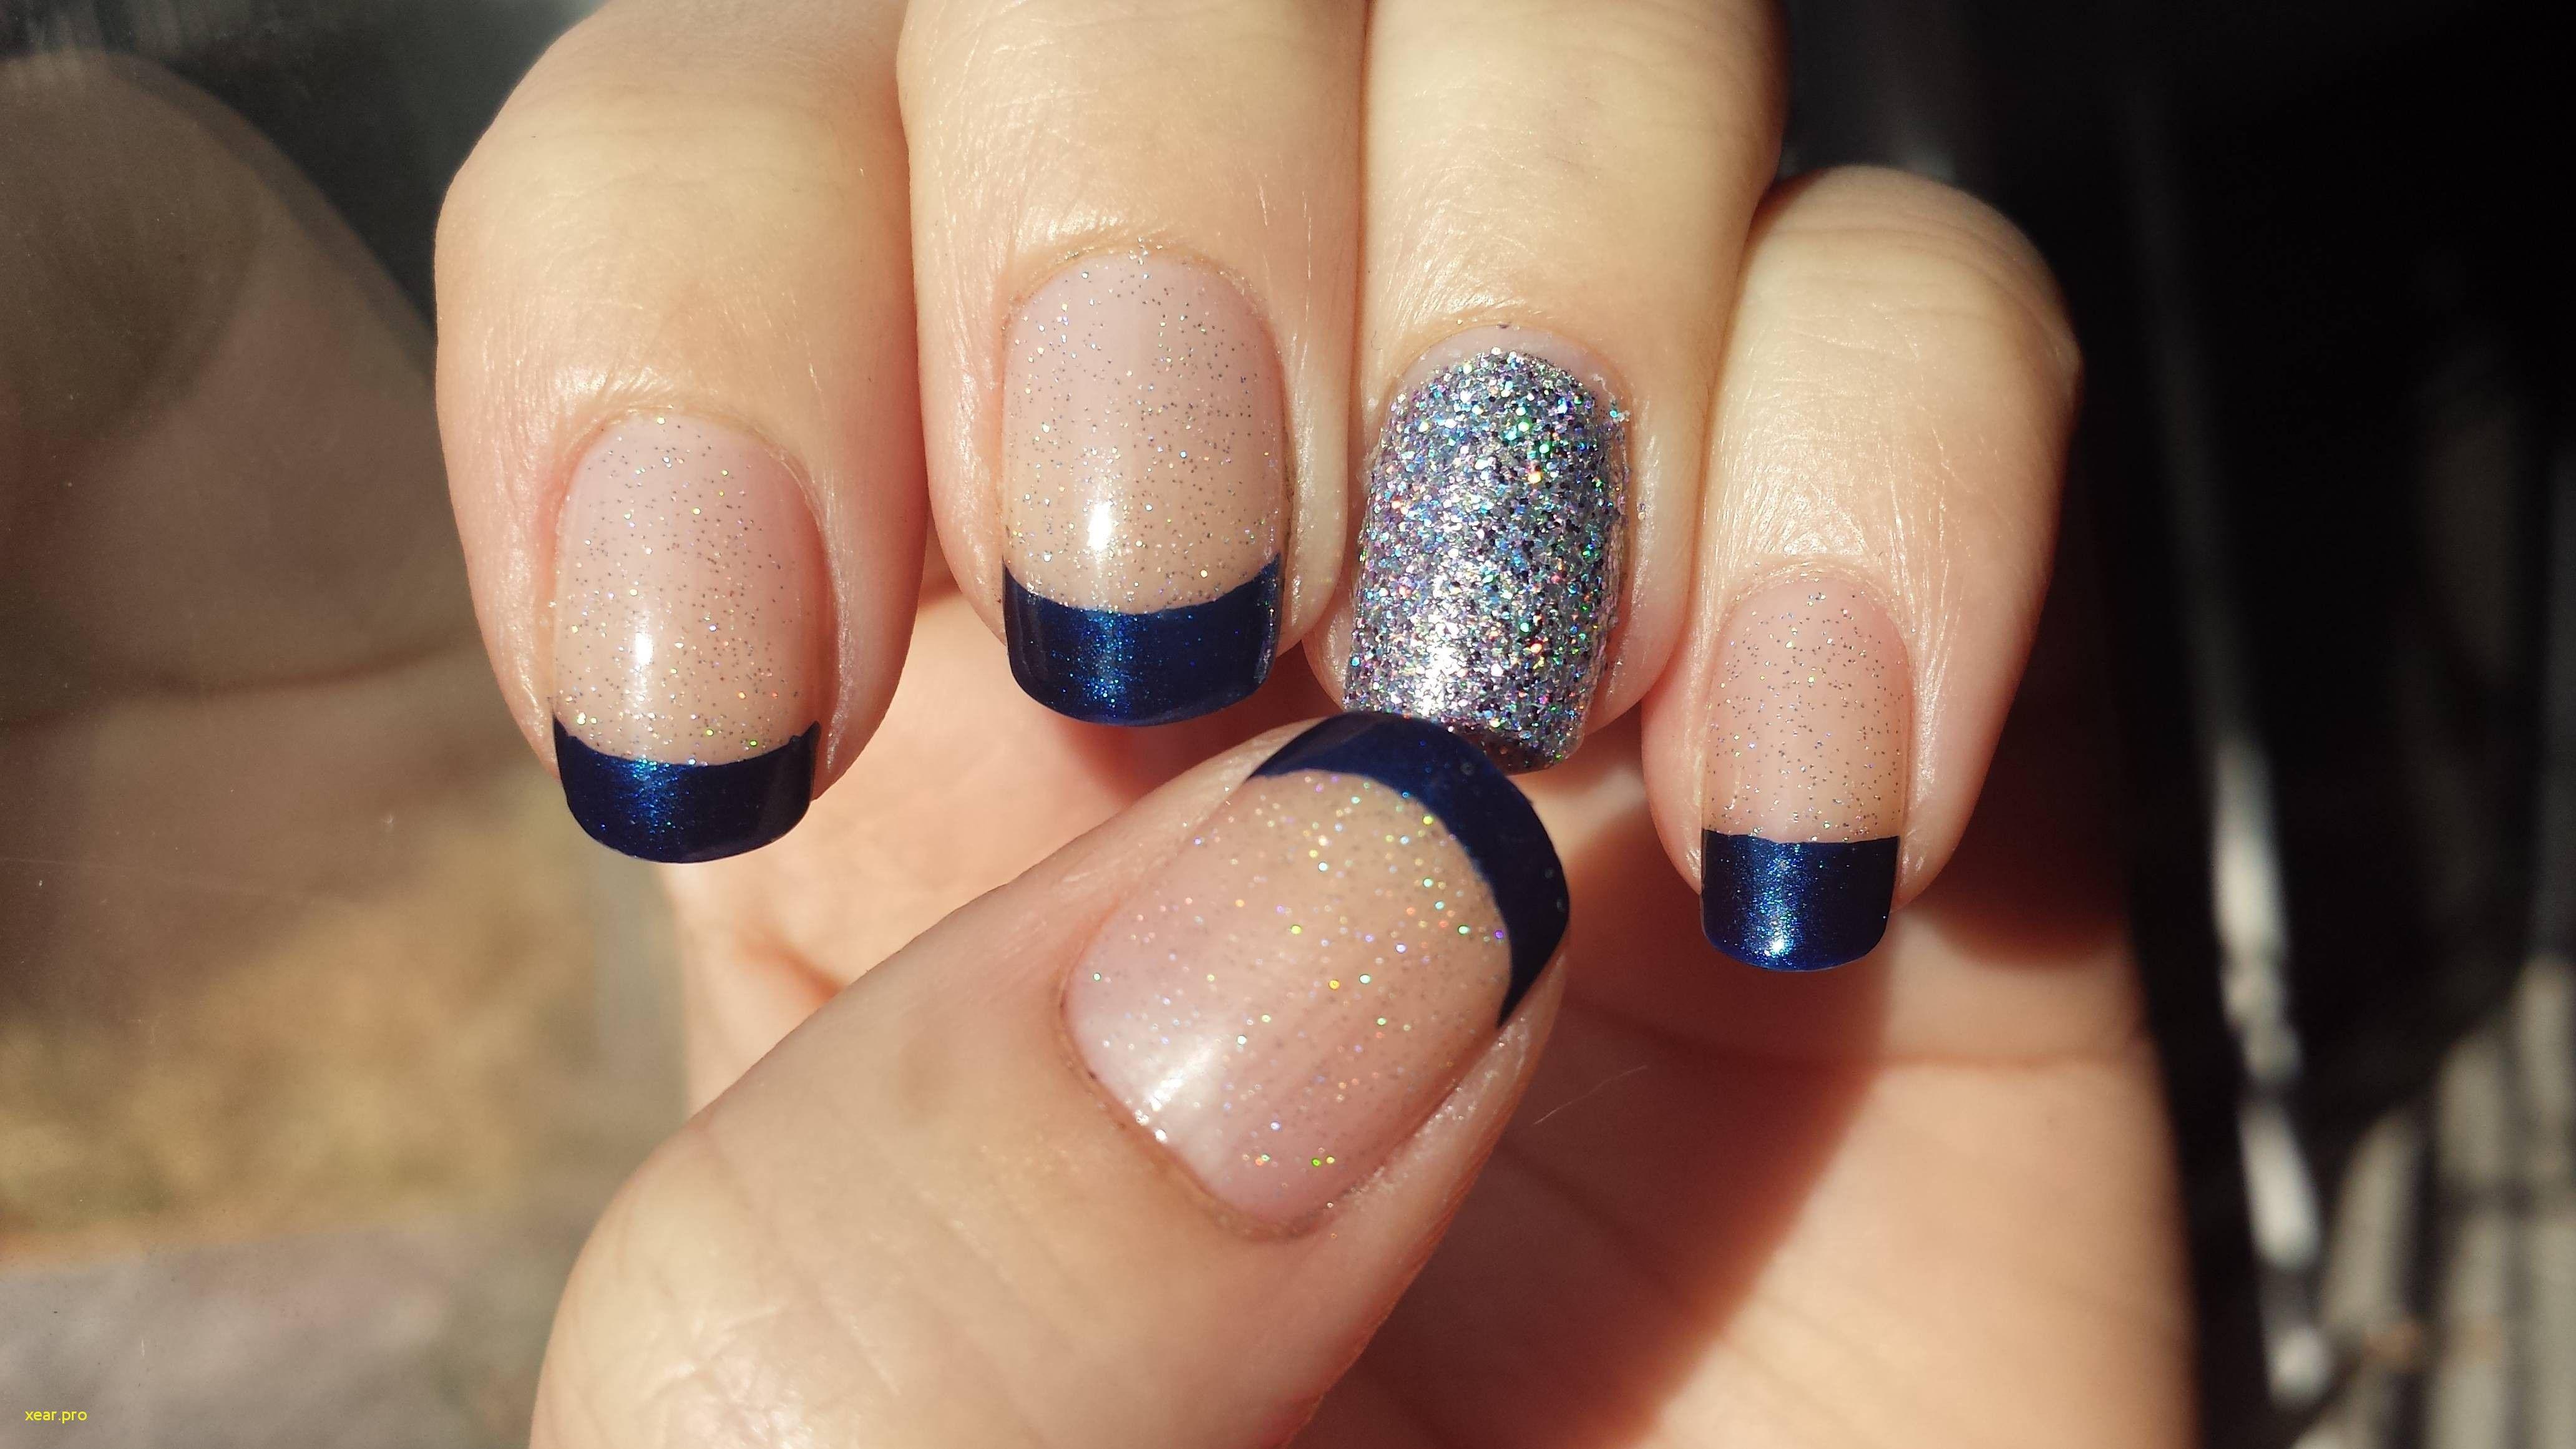 Unique 2 Nail Colors That Go Together Blue Nail Art Designs Navy Blue Nails Blue Nail Color